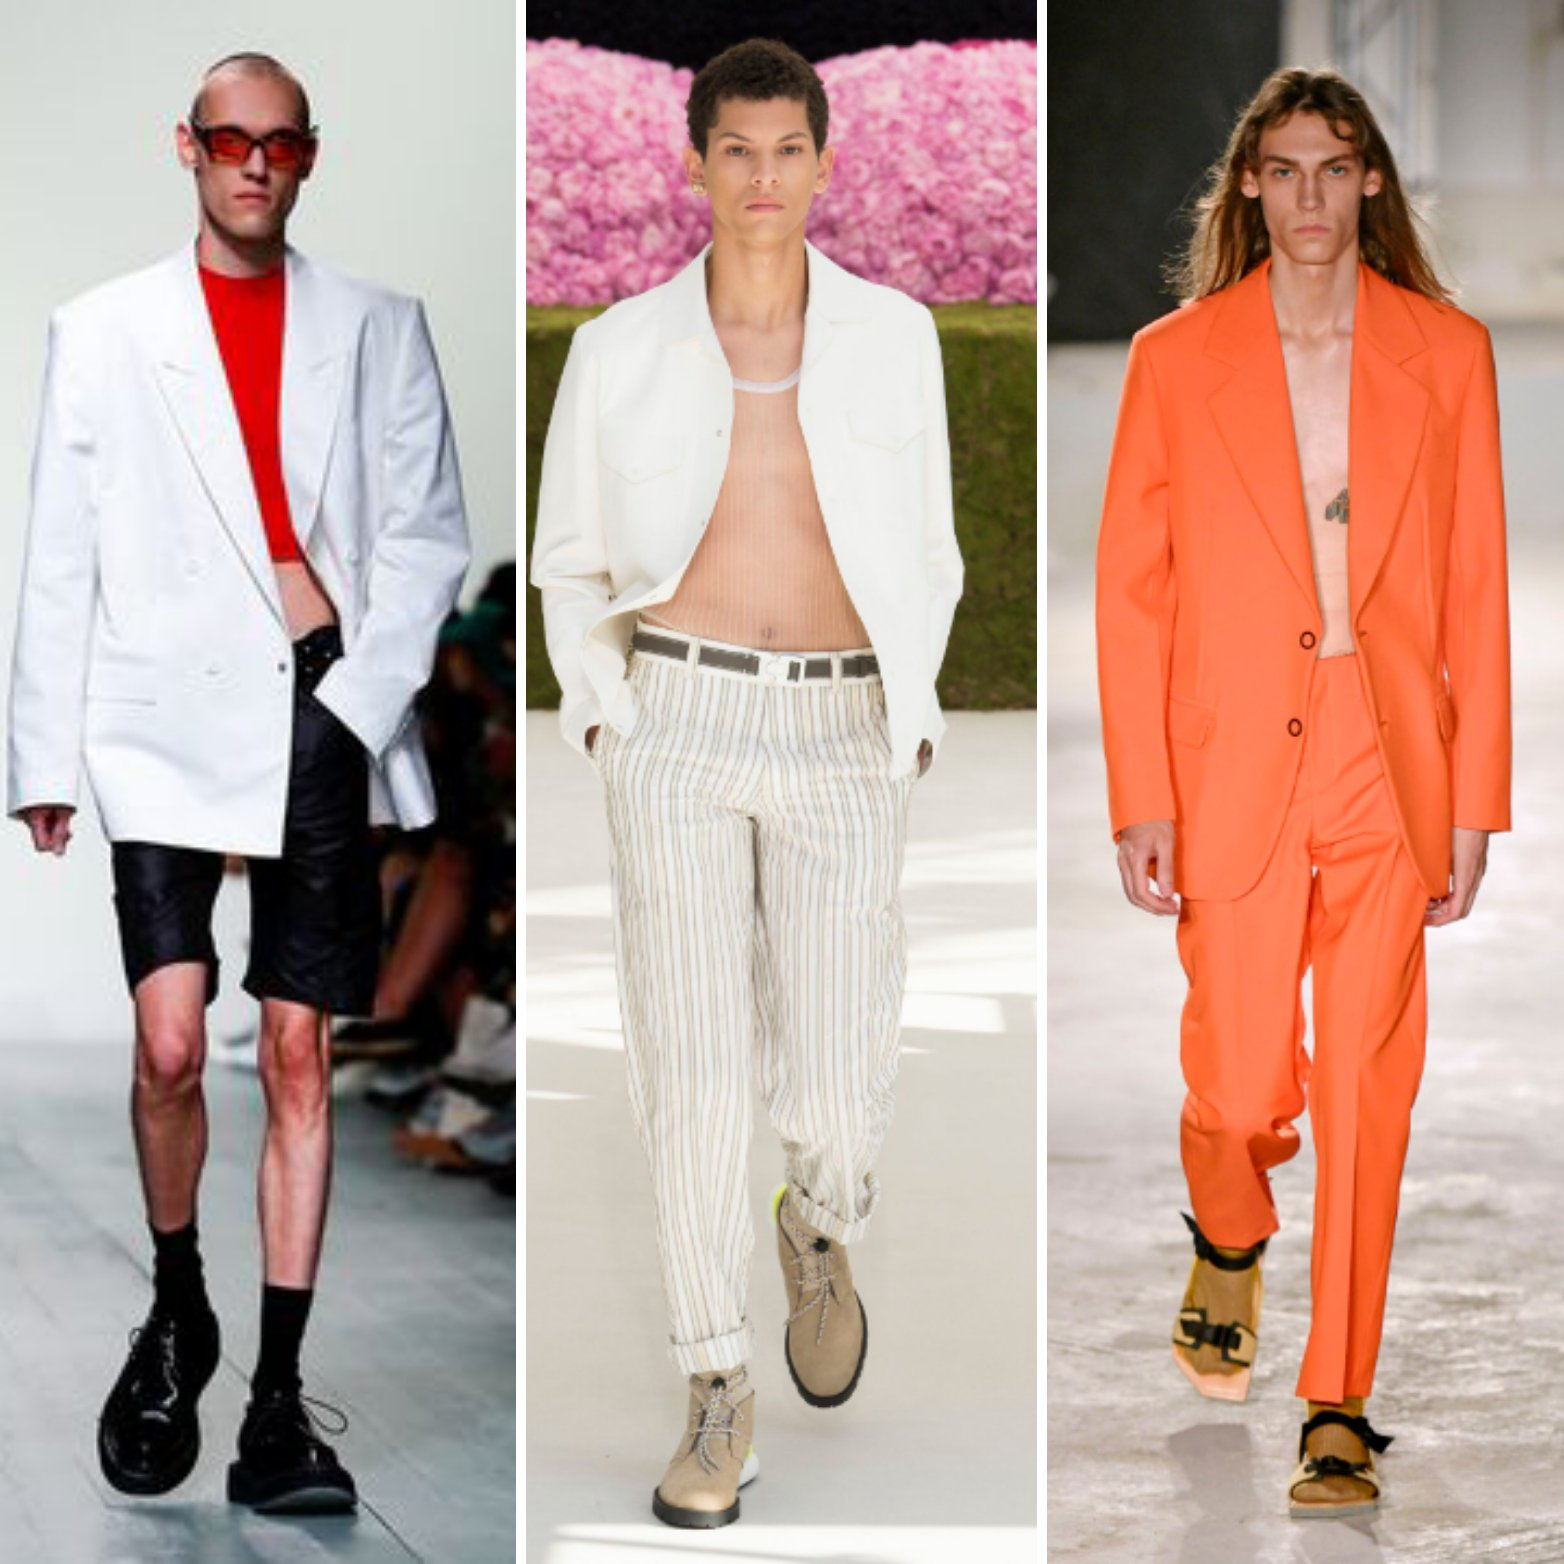 Speing 2019 Men Fashion Trends The Fashion Goddess